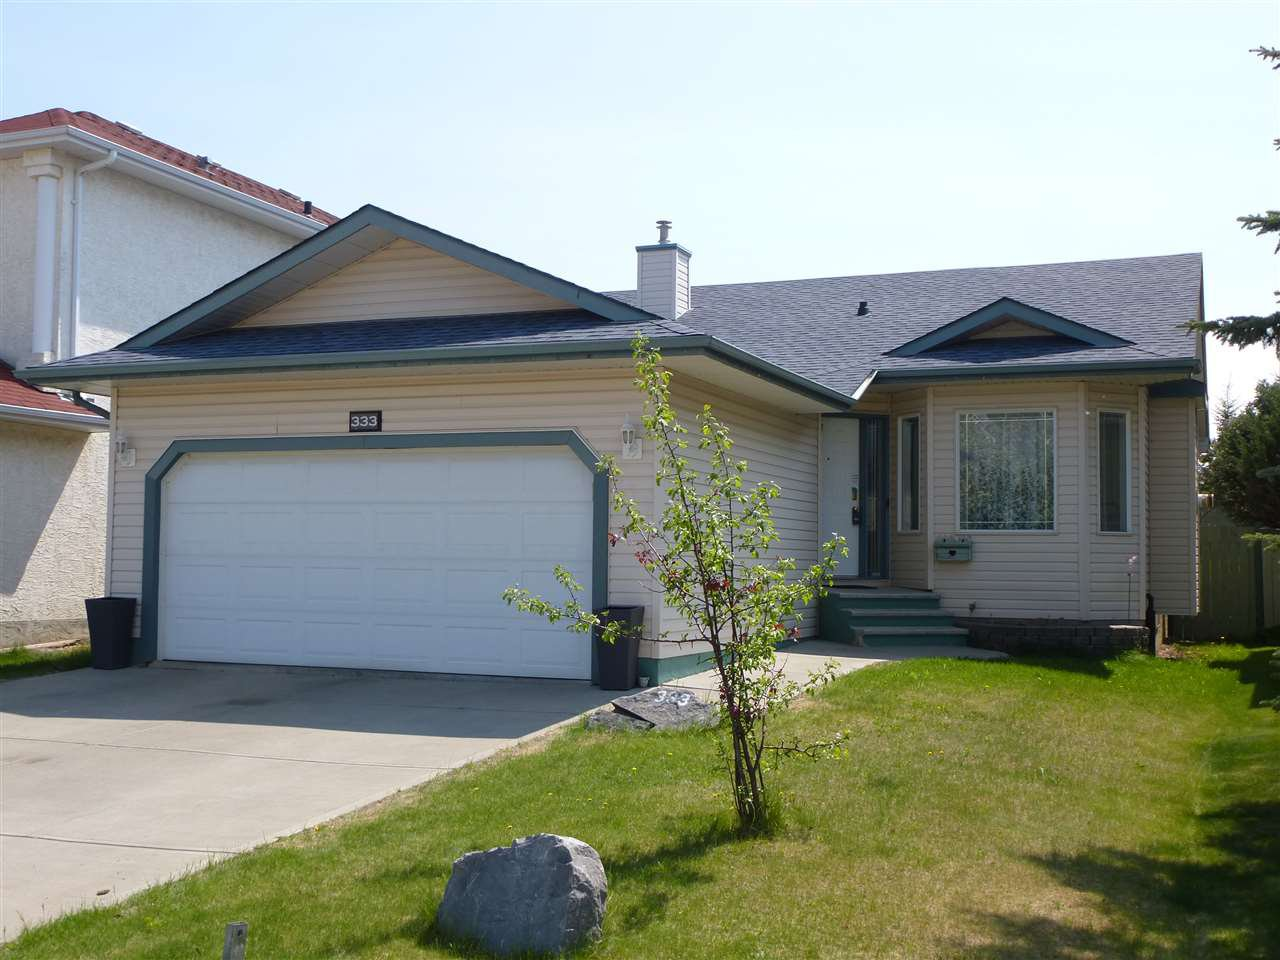 Main Photo: 333 BERINGER Crescent in Edmonton: Zone 58 House for sale : MLS®# E4168184